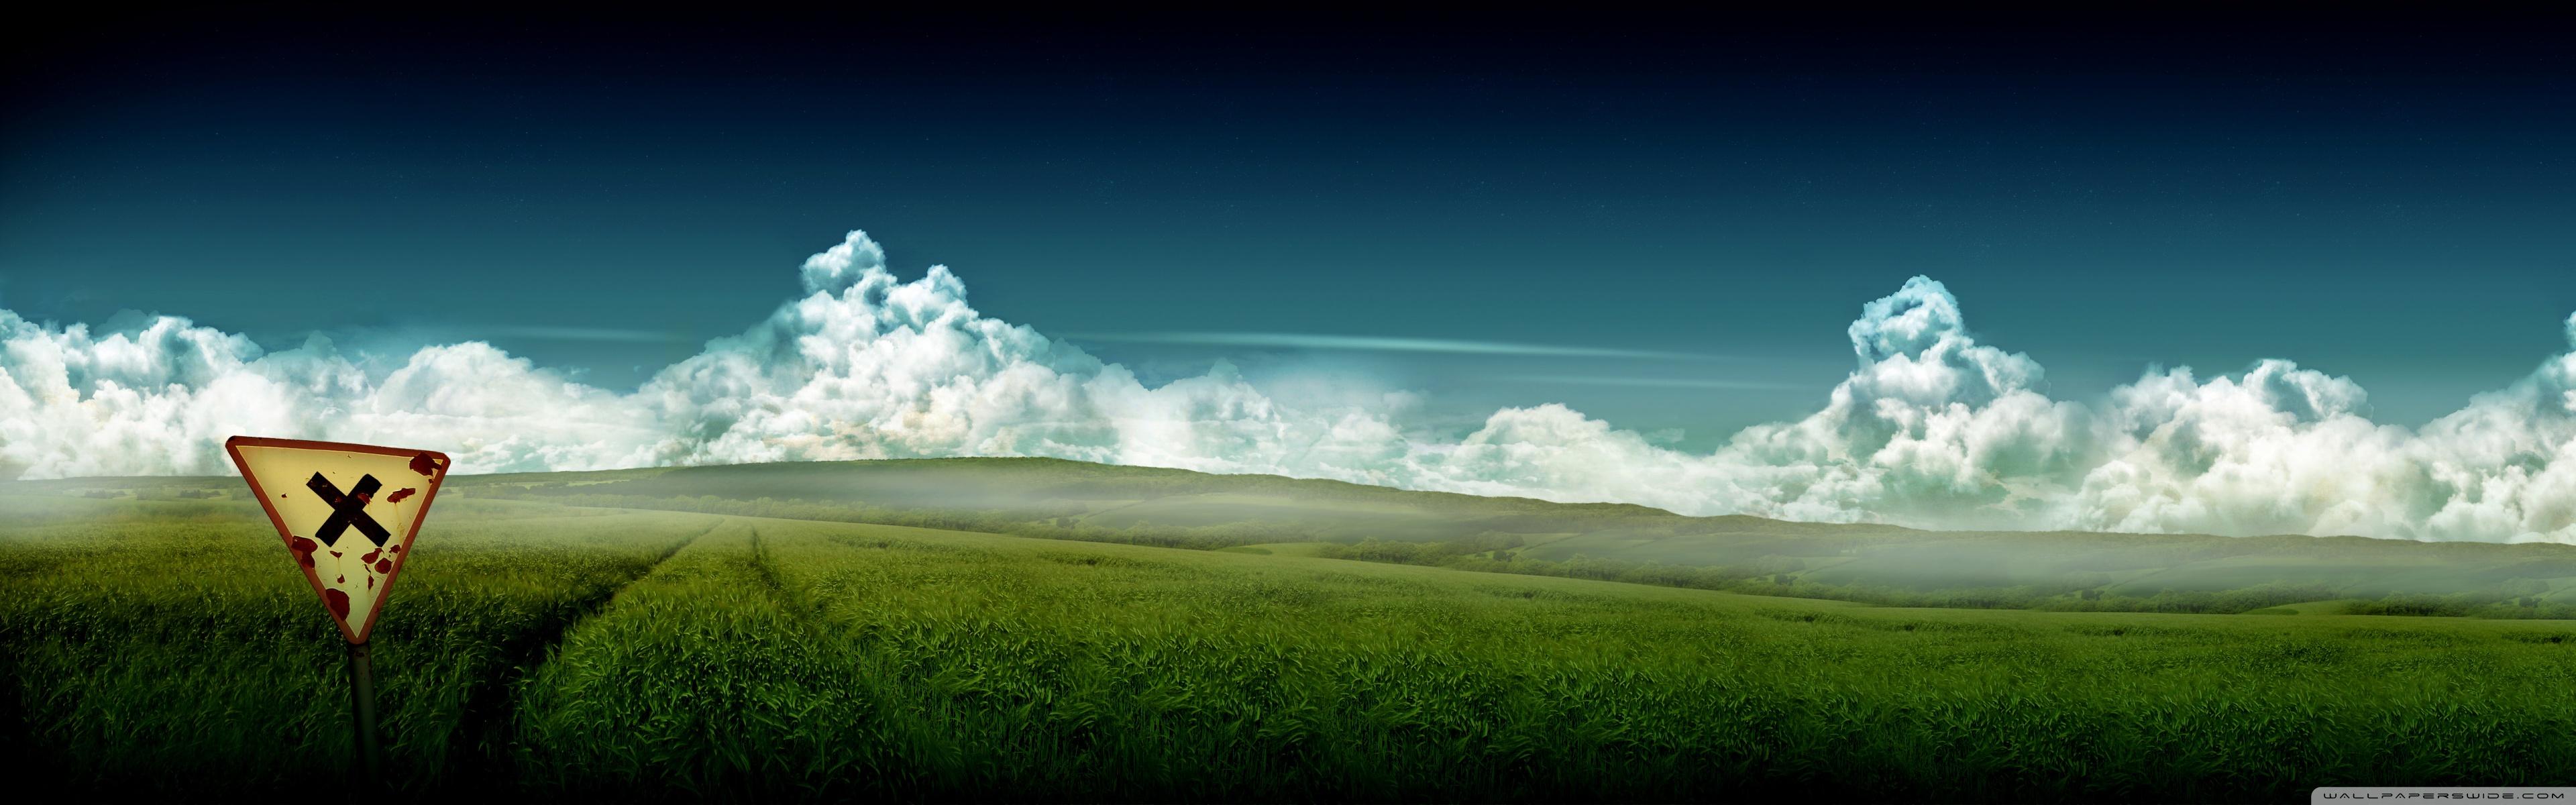 Artistic Wheat Field Wallpaper 38401200 276234 HD Wallpaper Res 3840x1200